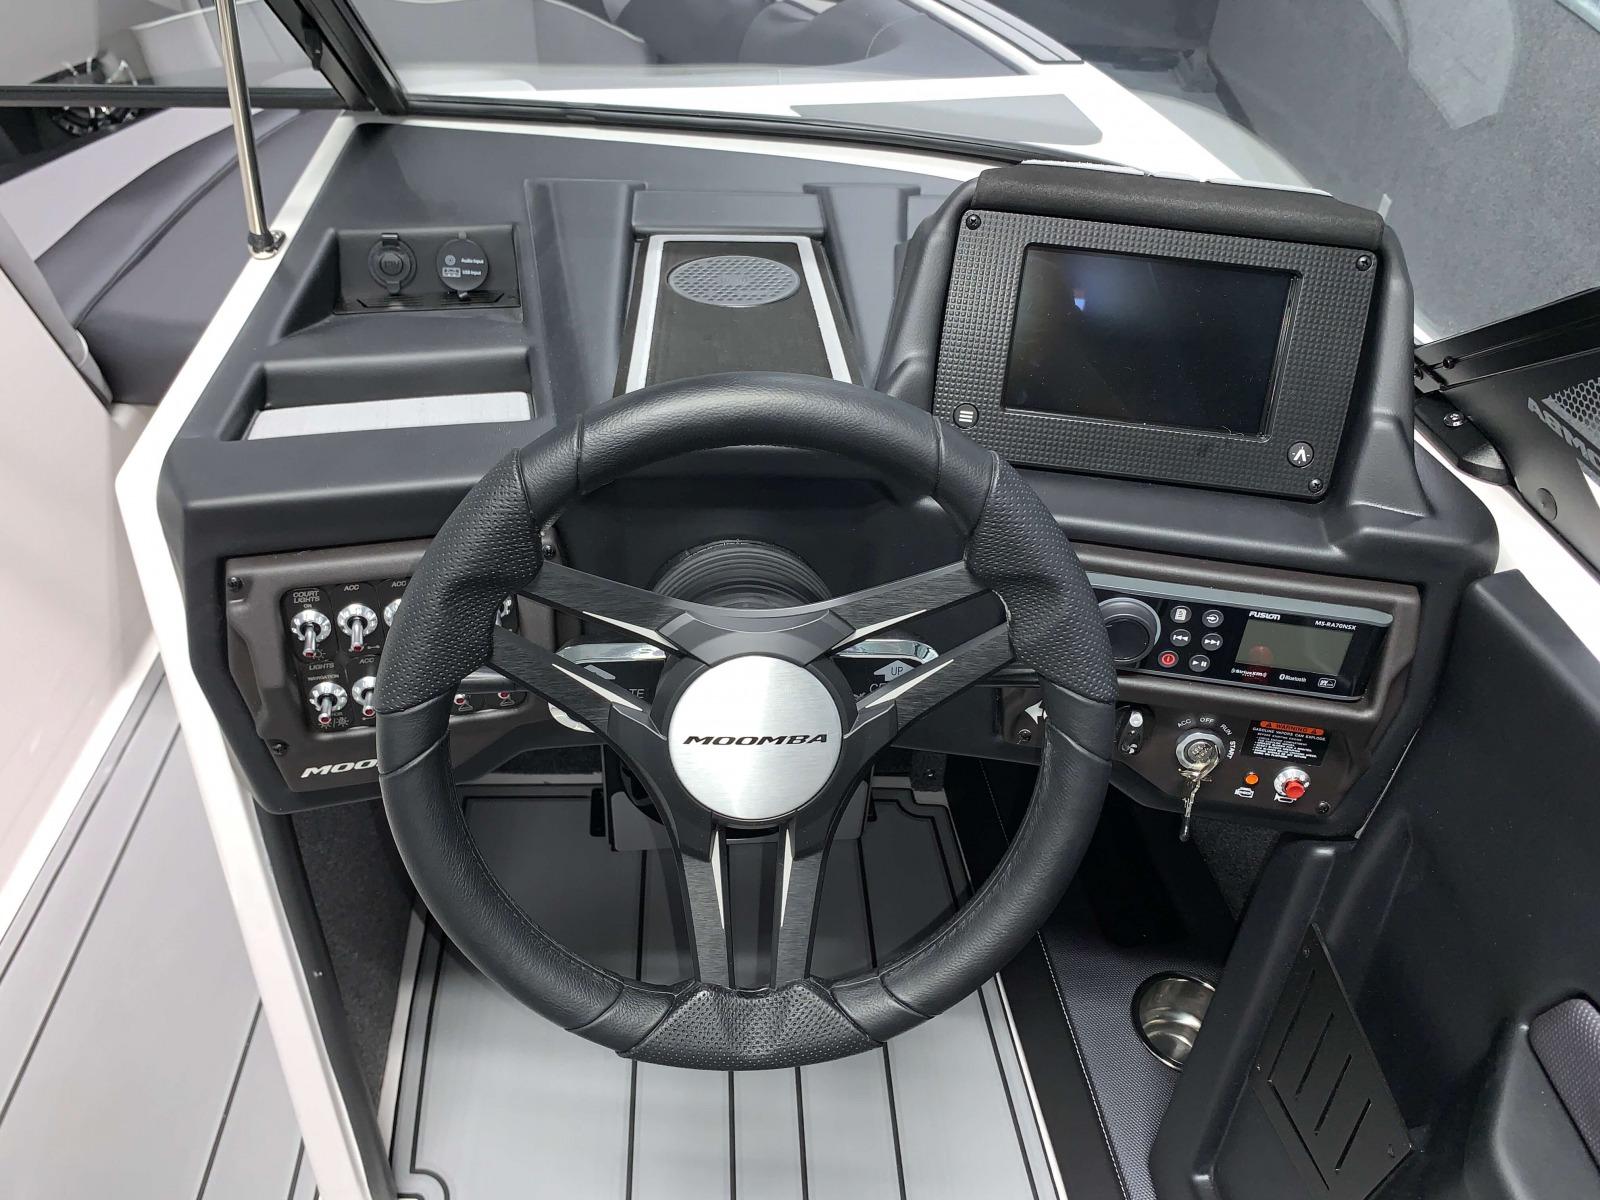 Helm of the 2021 Moomba Craz Wake Boat